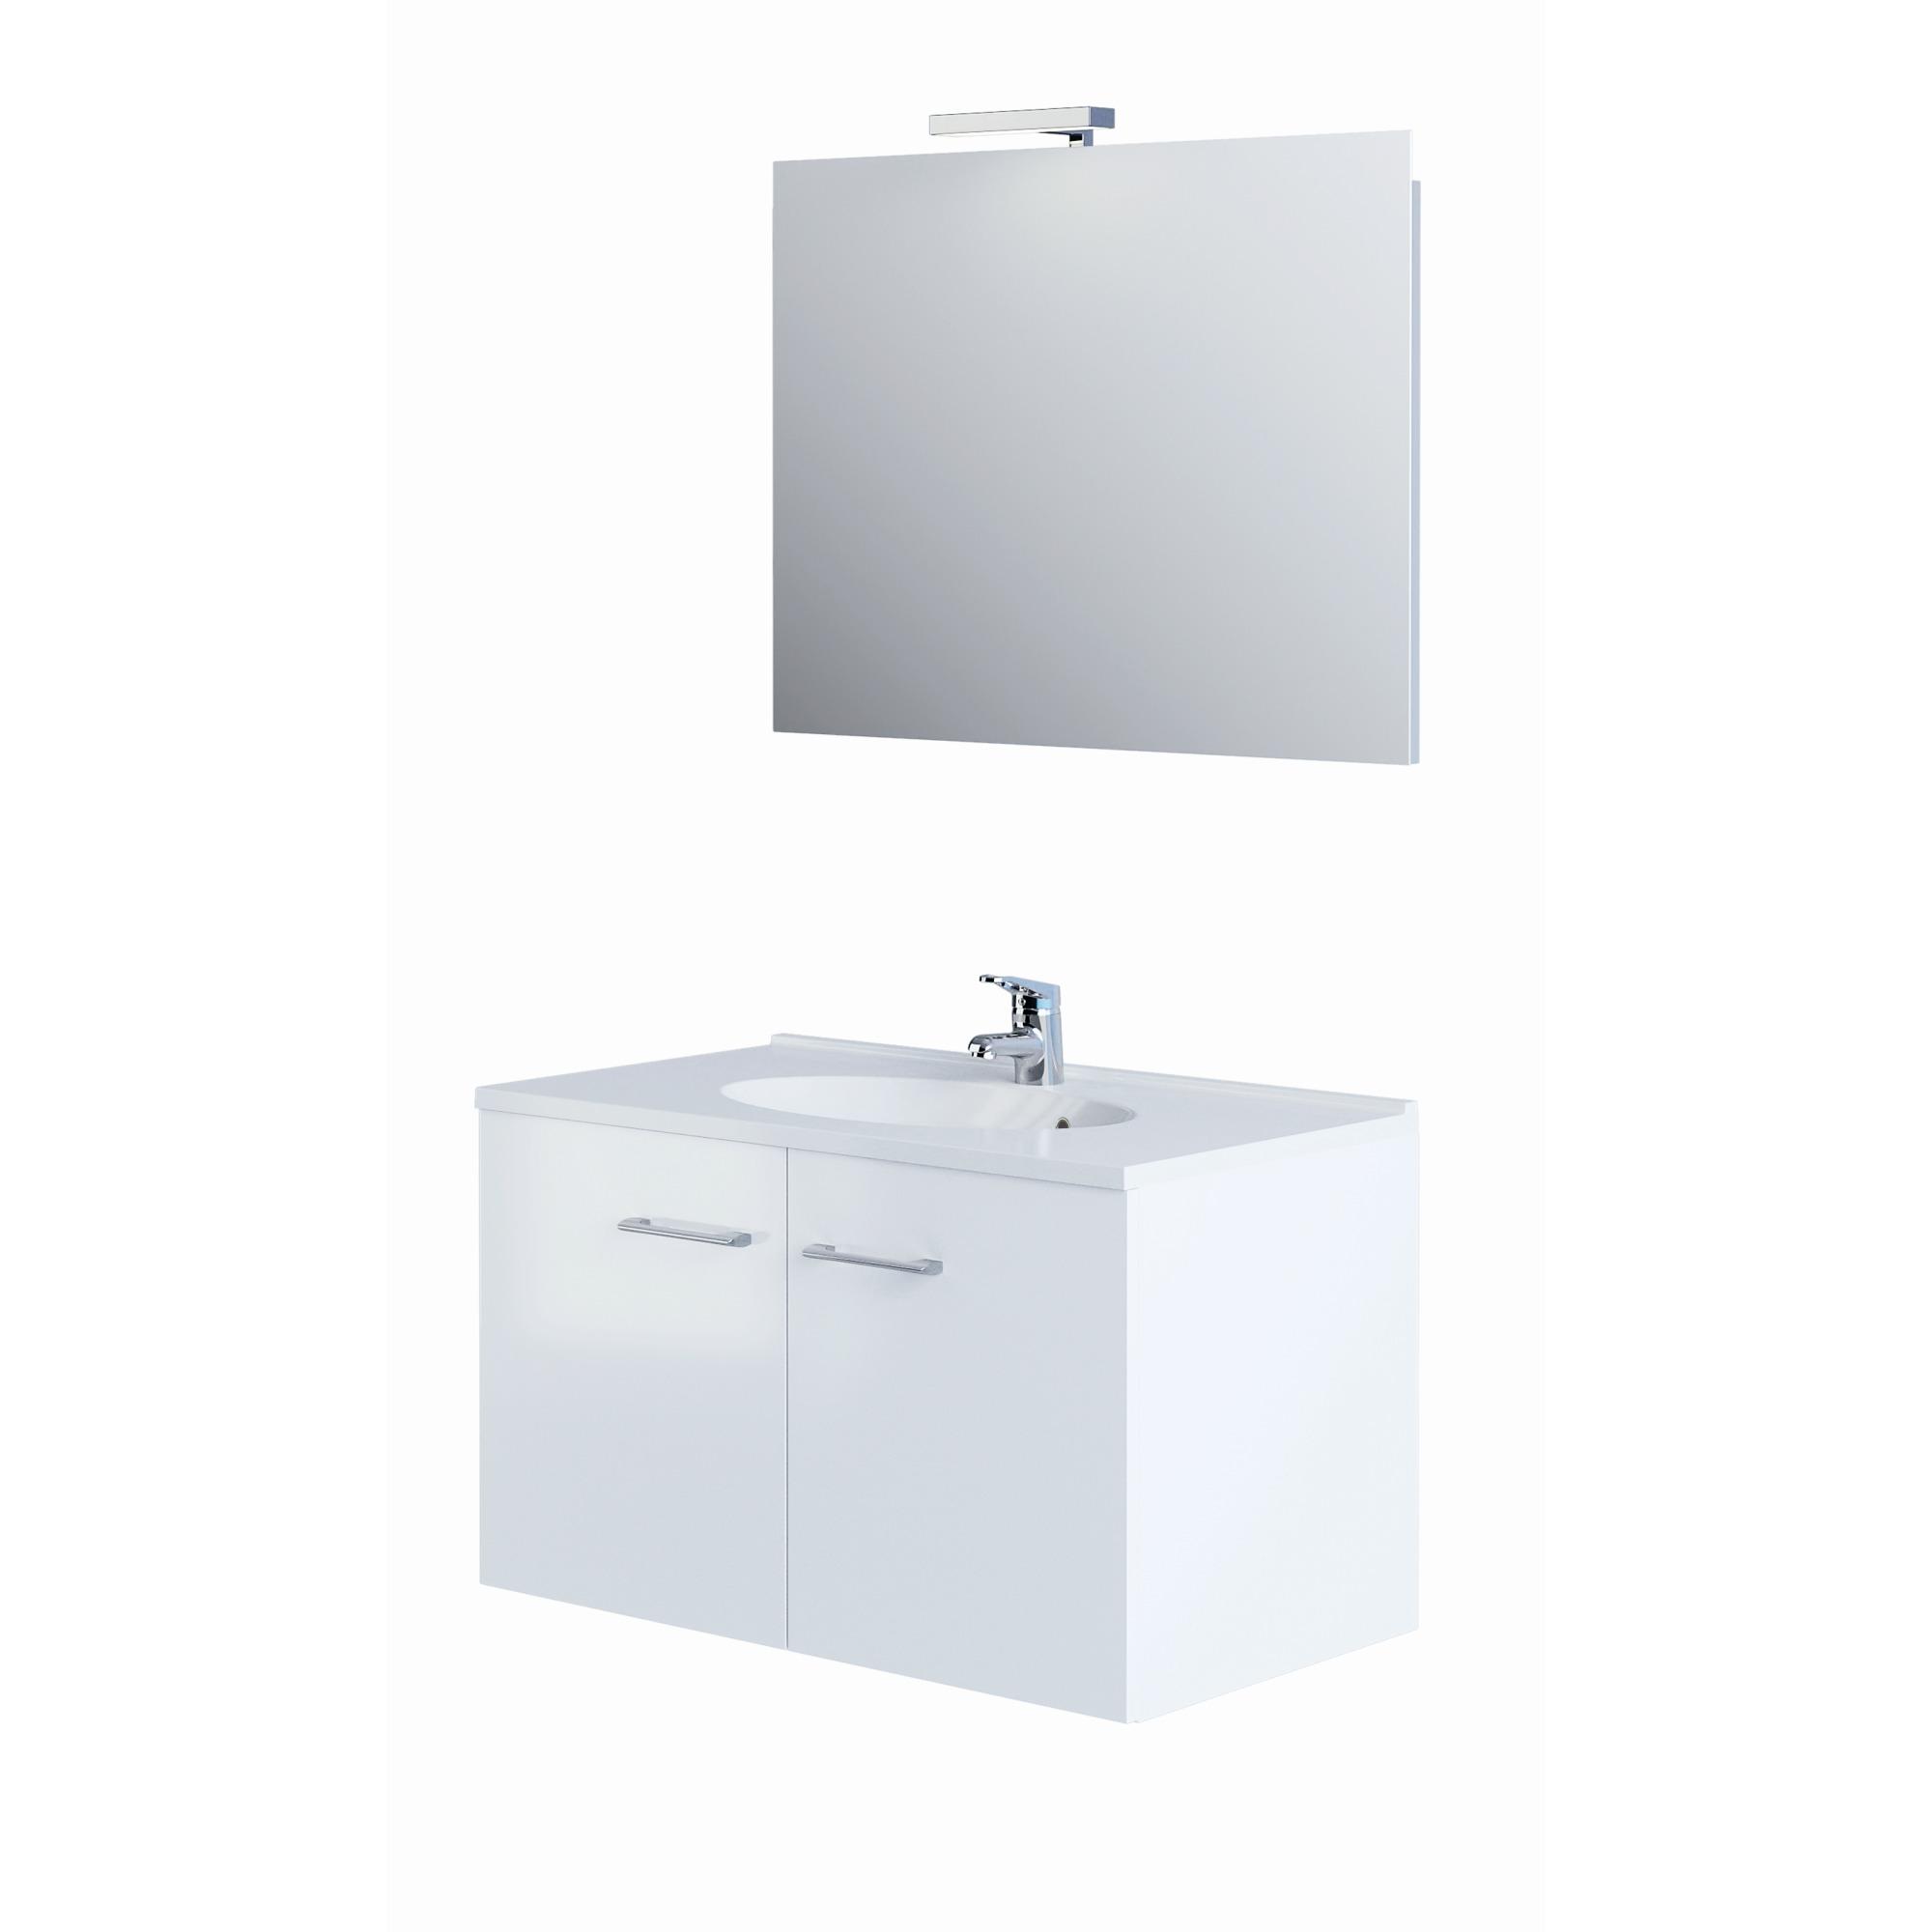 Allibert Bathroom Cabinets Allibert Smart Pack Badkamermeubel 80 Cm Glanzend Wit